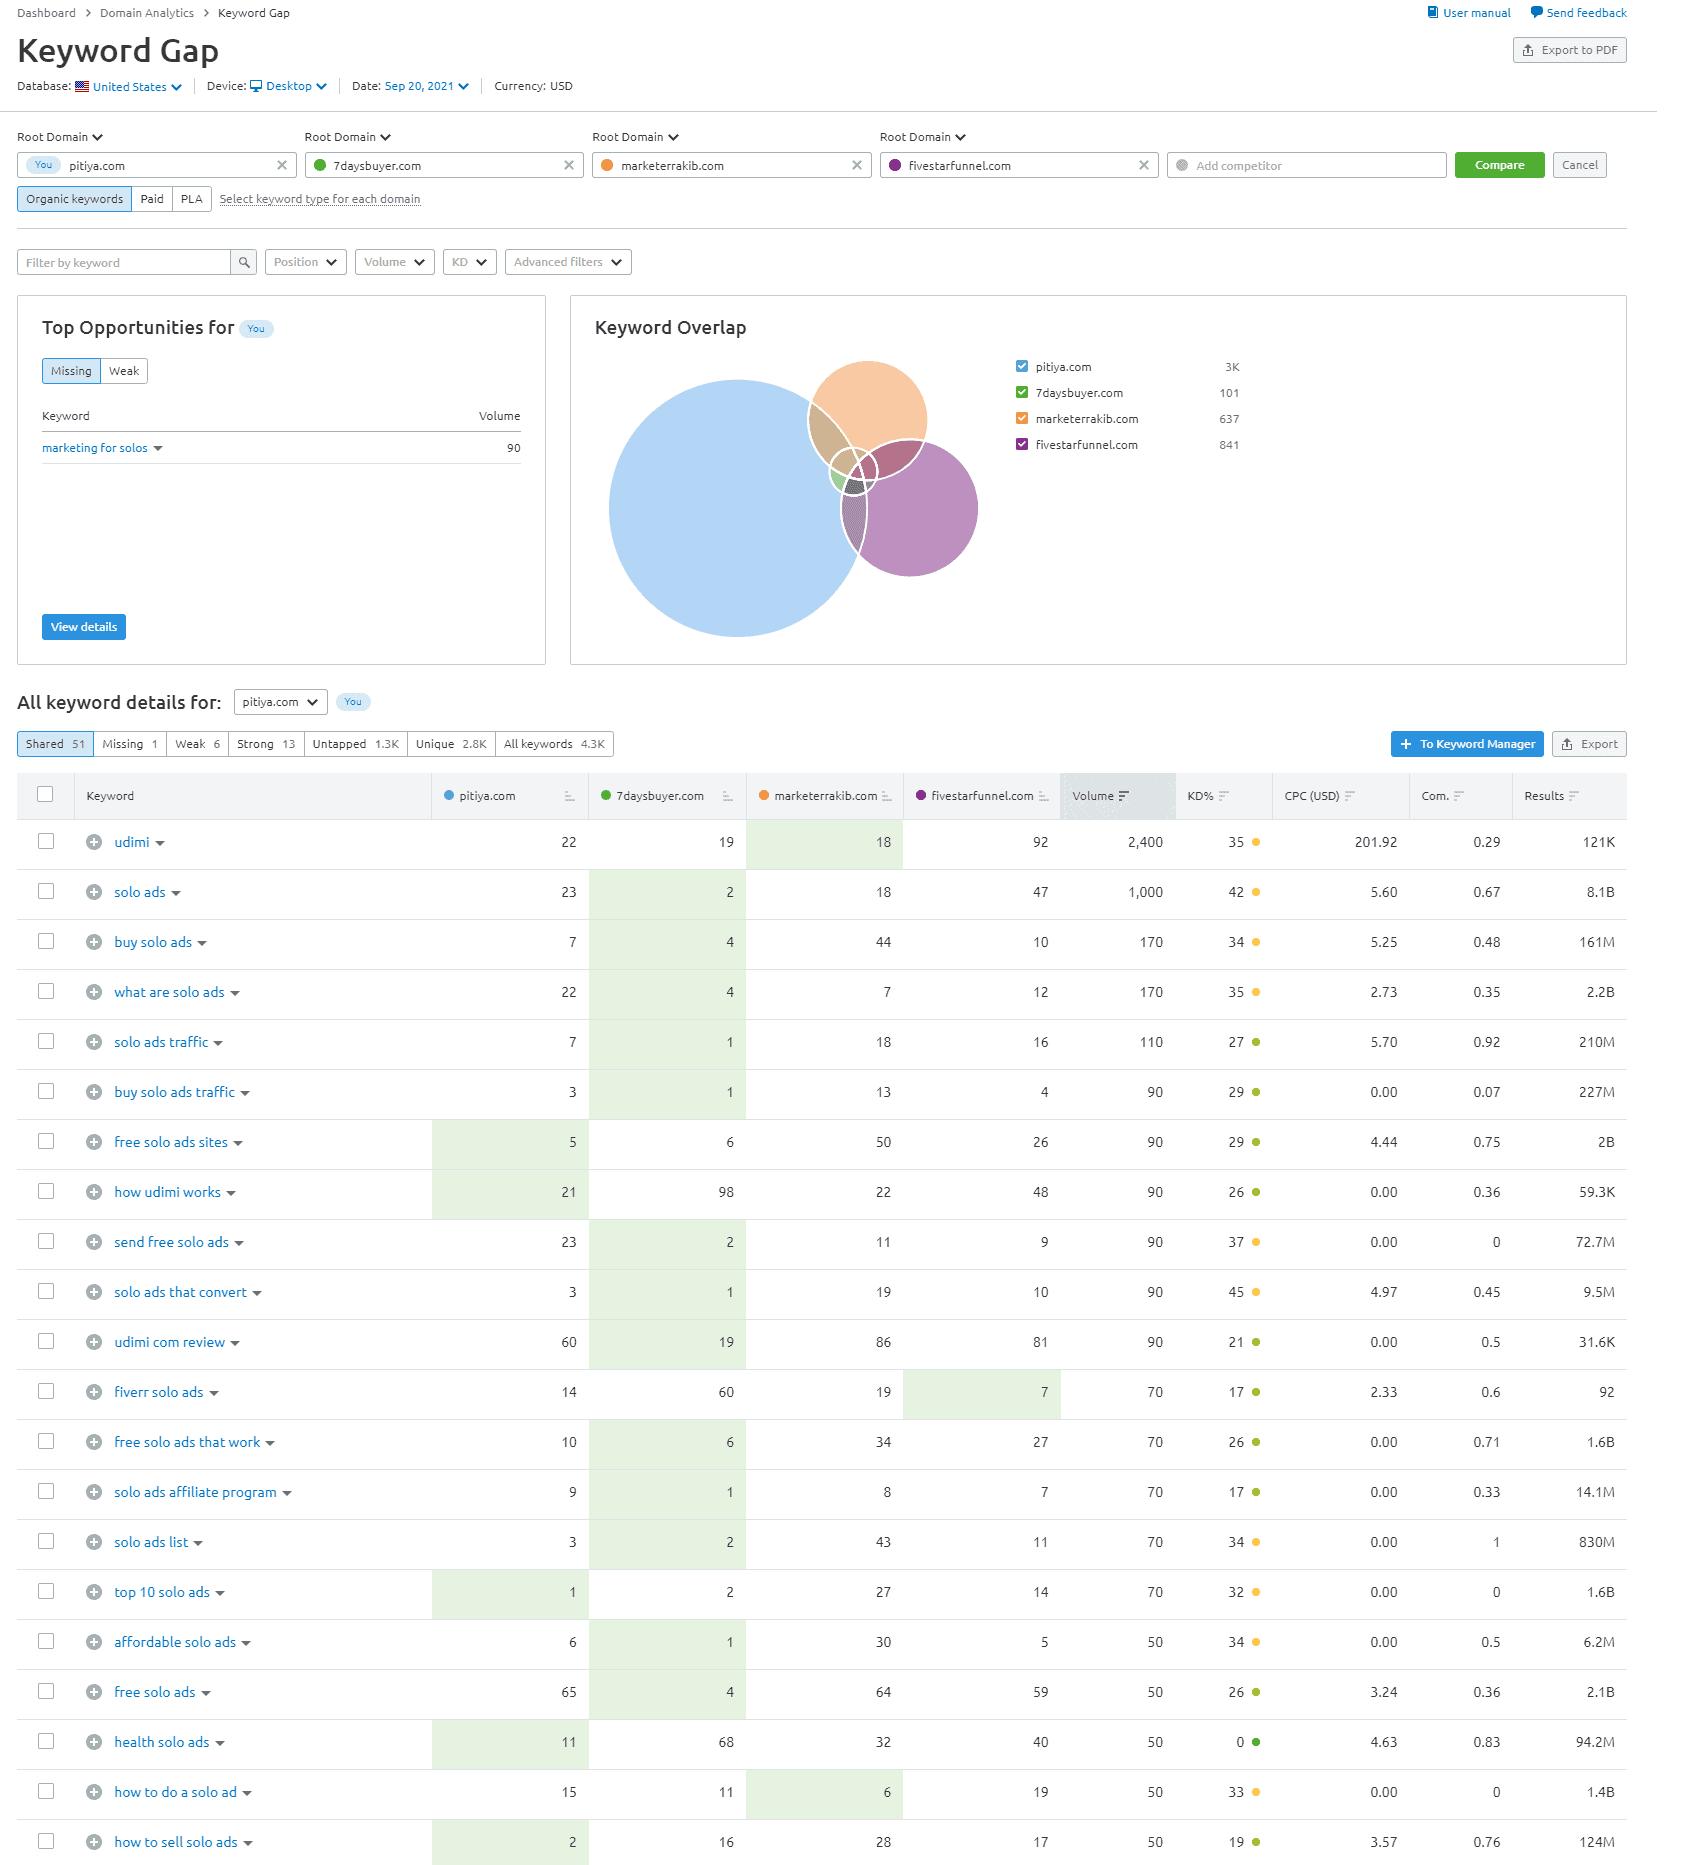 semrush-keyword-gap-analytics